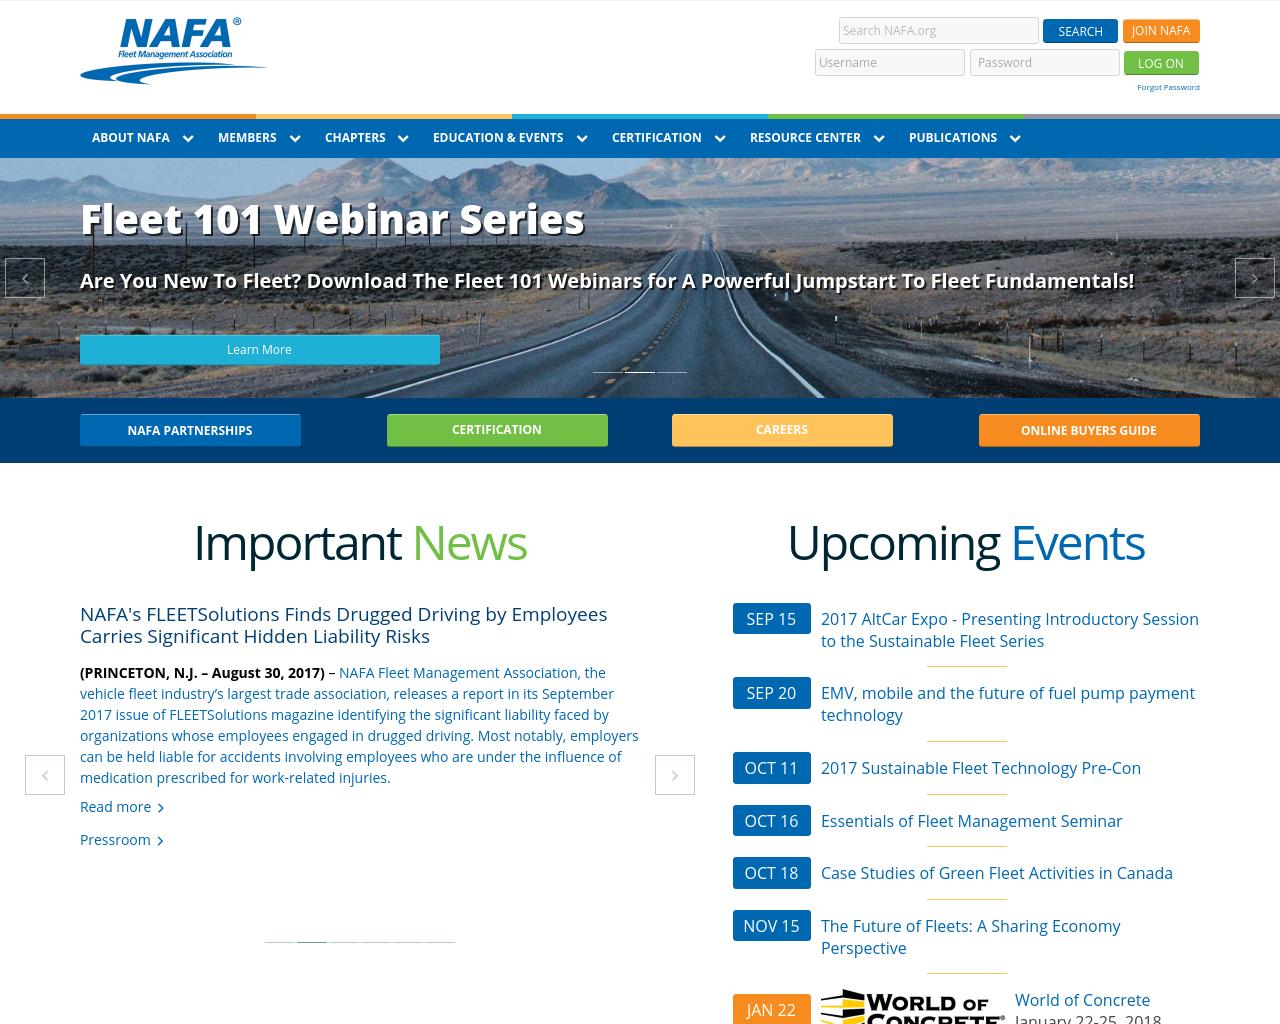 NAFA-Fleet-Management-Association-Advertising-Reviews-Pricing